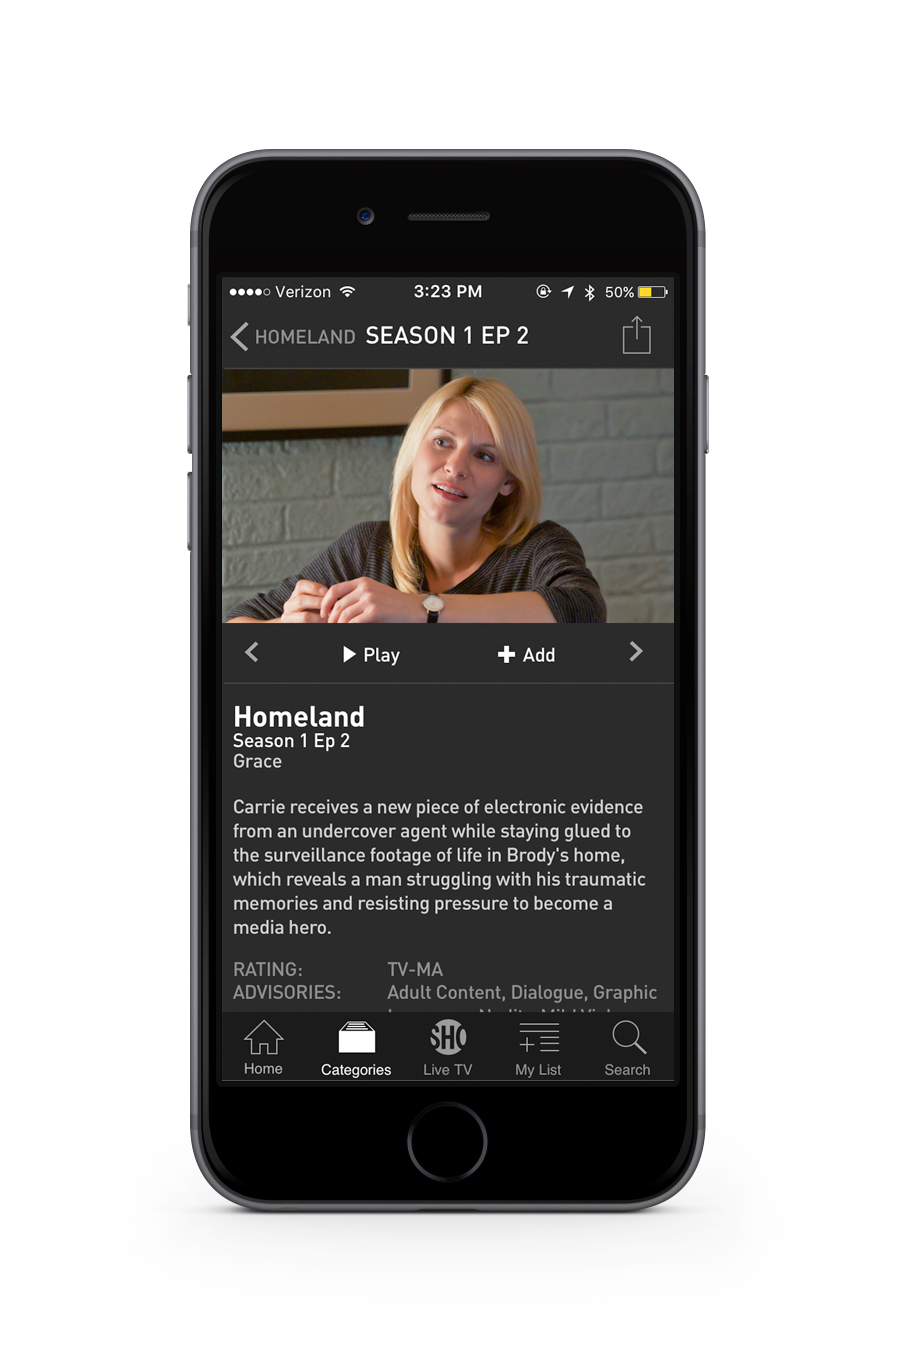 showtime-app-covershot-1.png